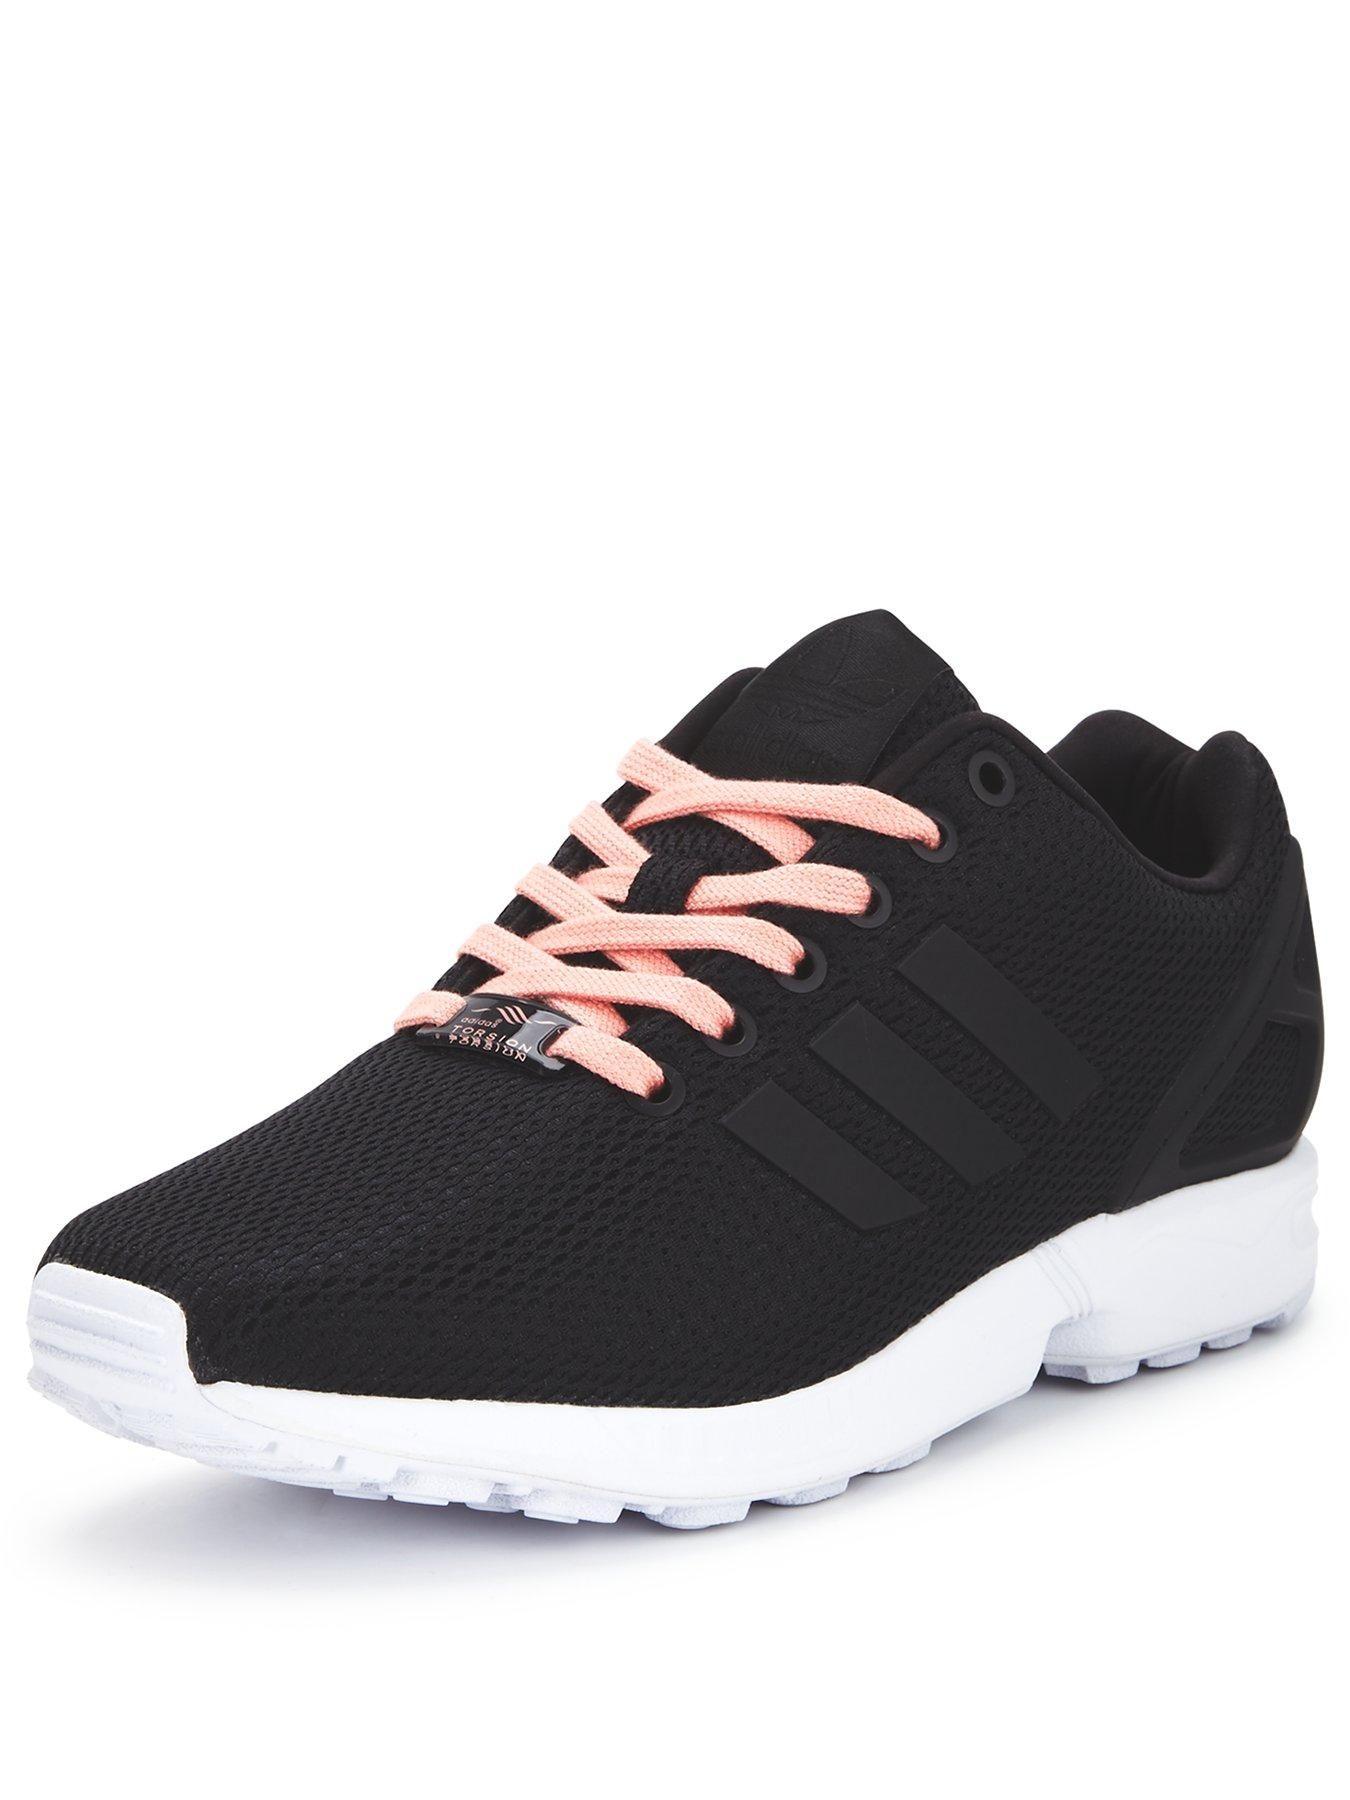 Plastic heels, Adidas originals zx flux